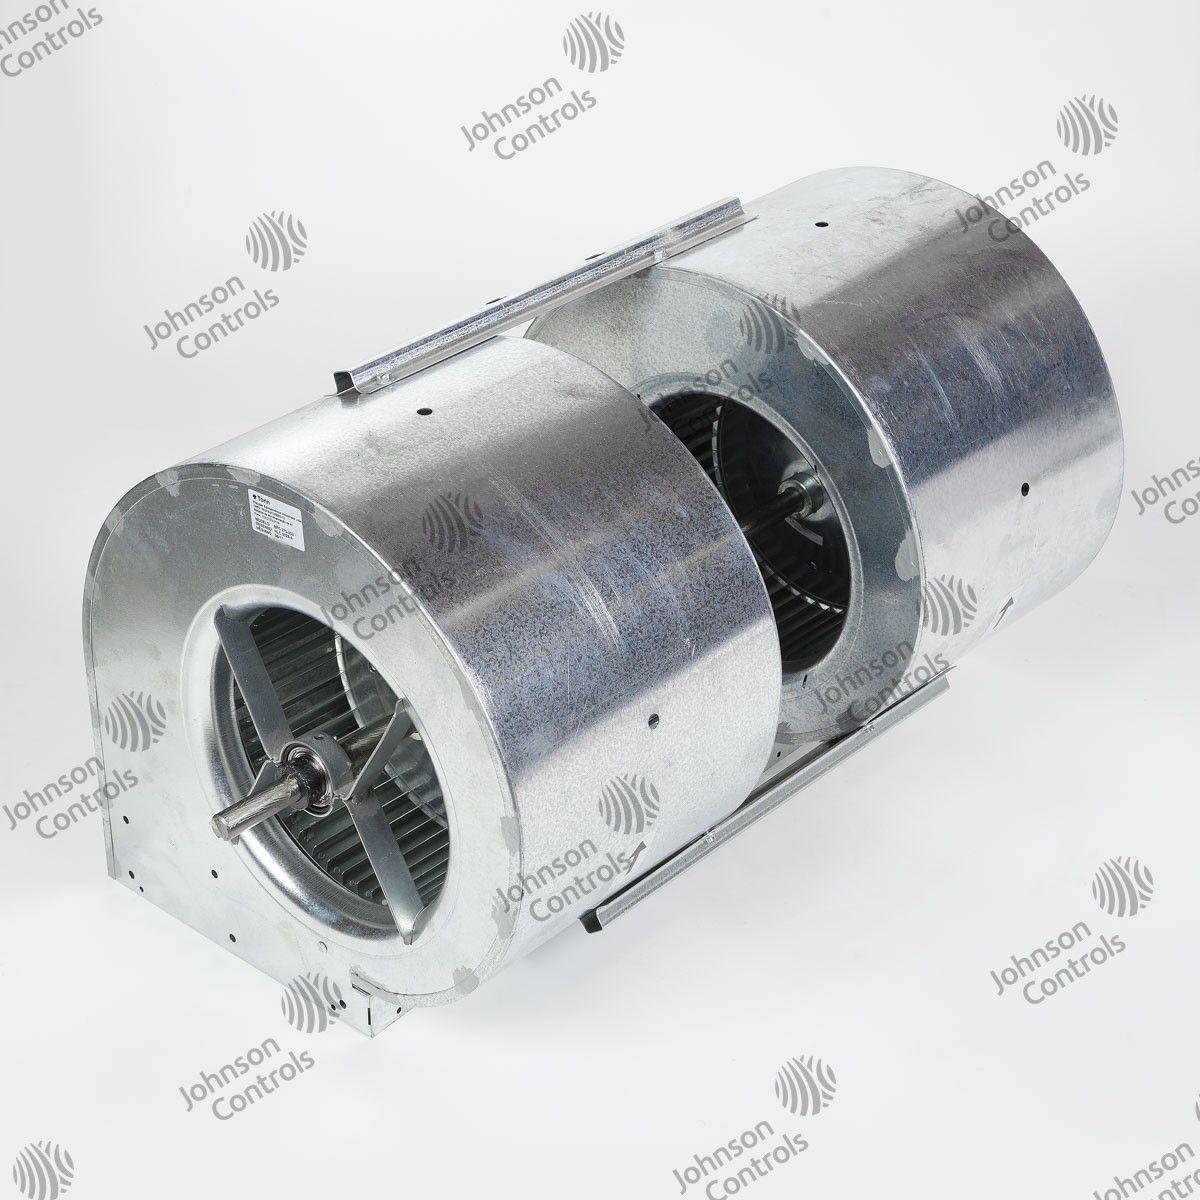 CJ.VEN(CTI)VSD-20-2BPC-270-270 - HLC2400B